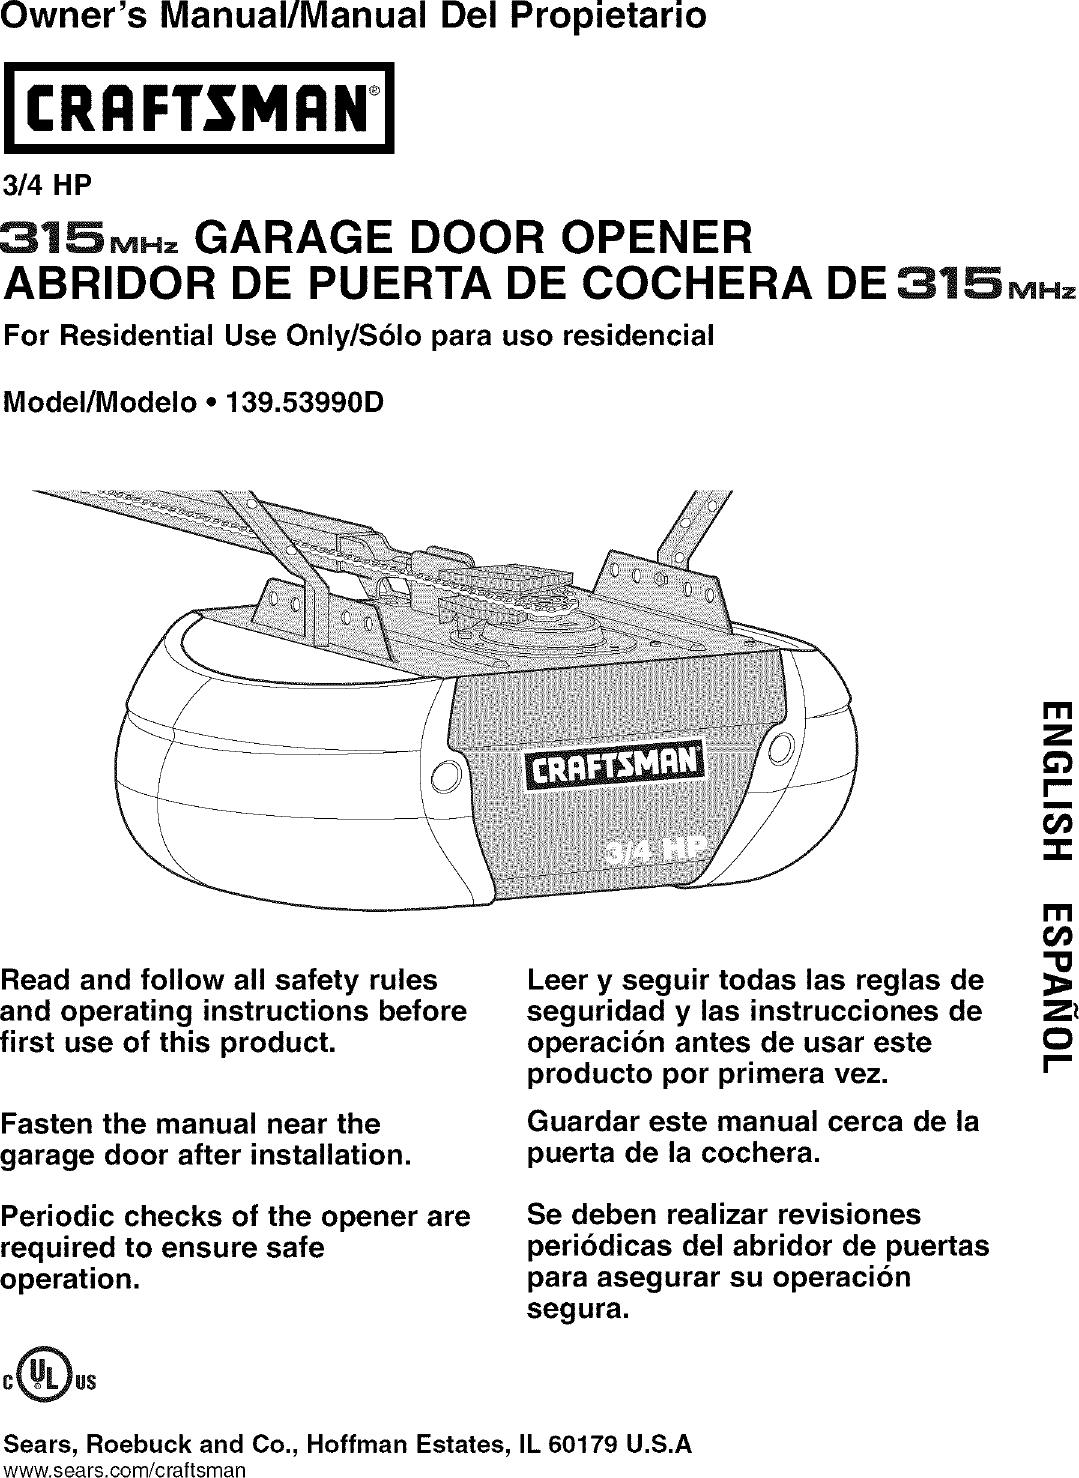 Craftsman 13953990d User Manual Garage Door Opener Manuals And Guides L0610432